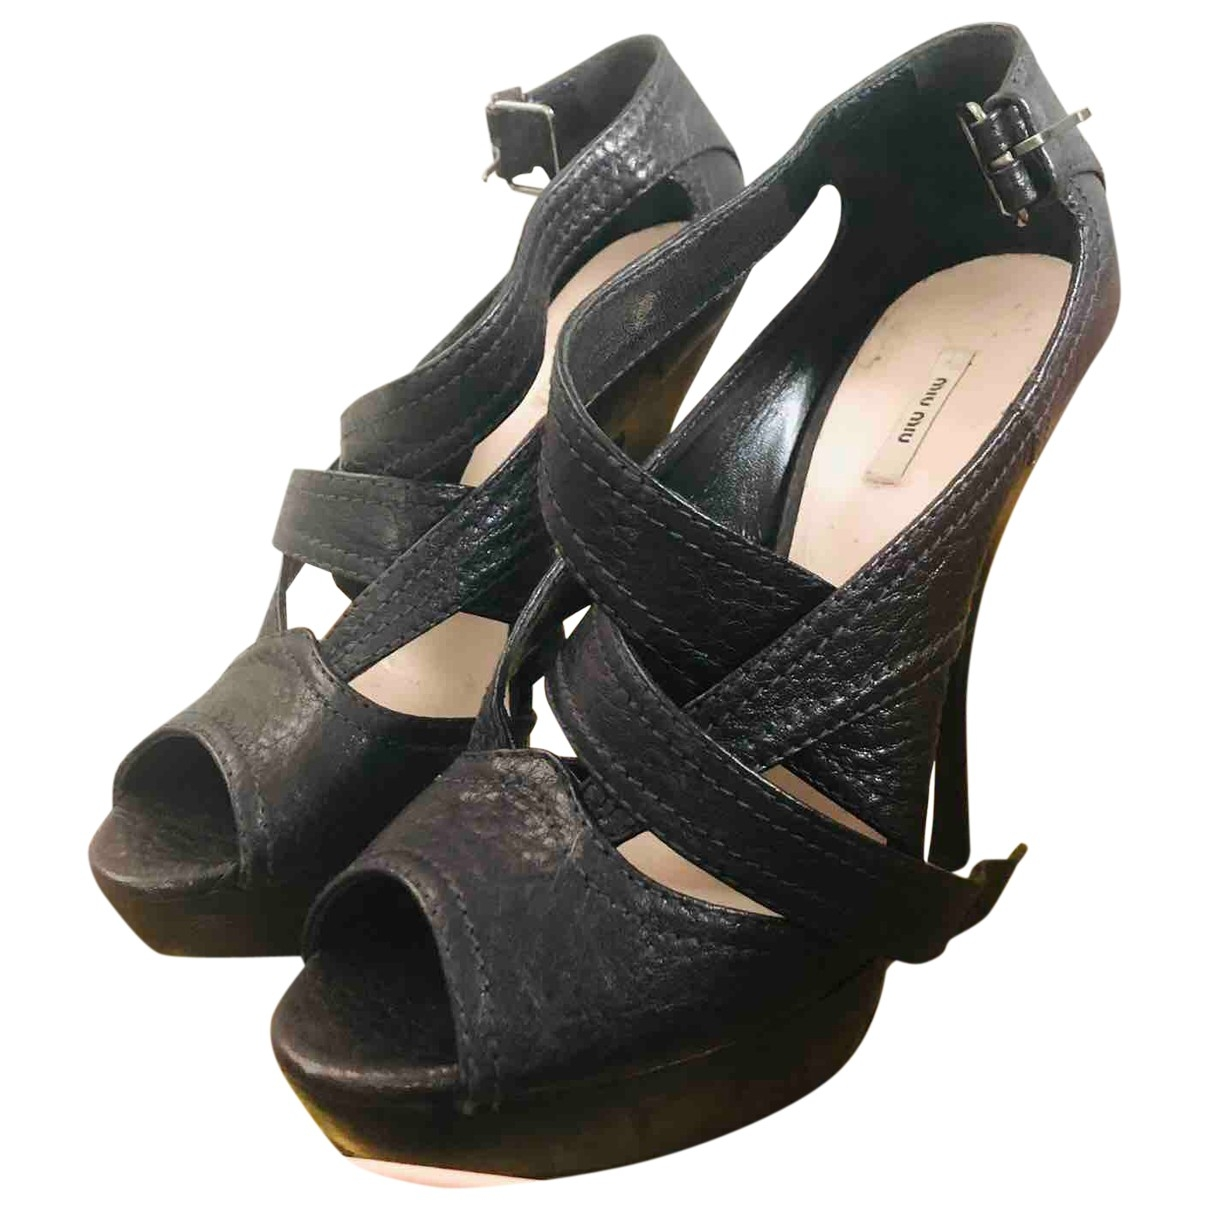 Miu Miu \N Black Leather Heels for Women 36.5 EU